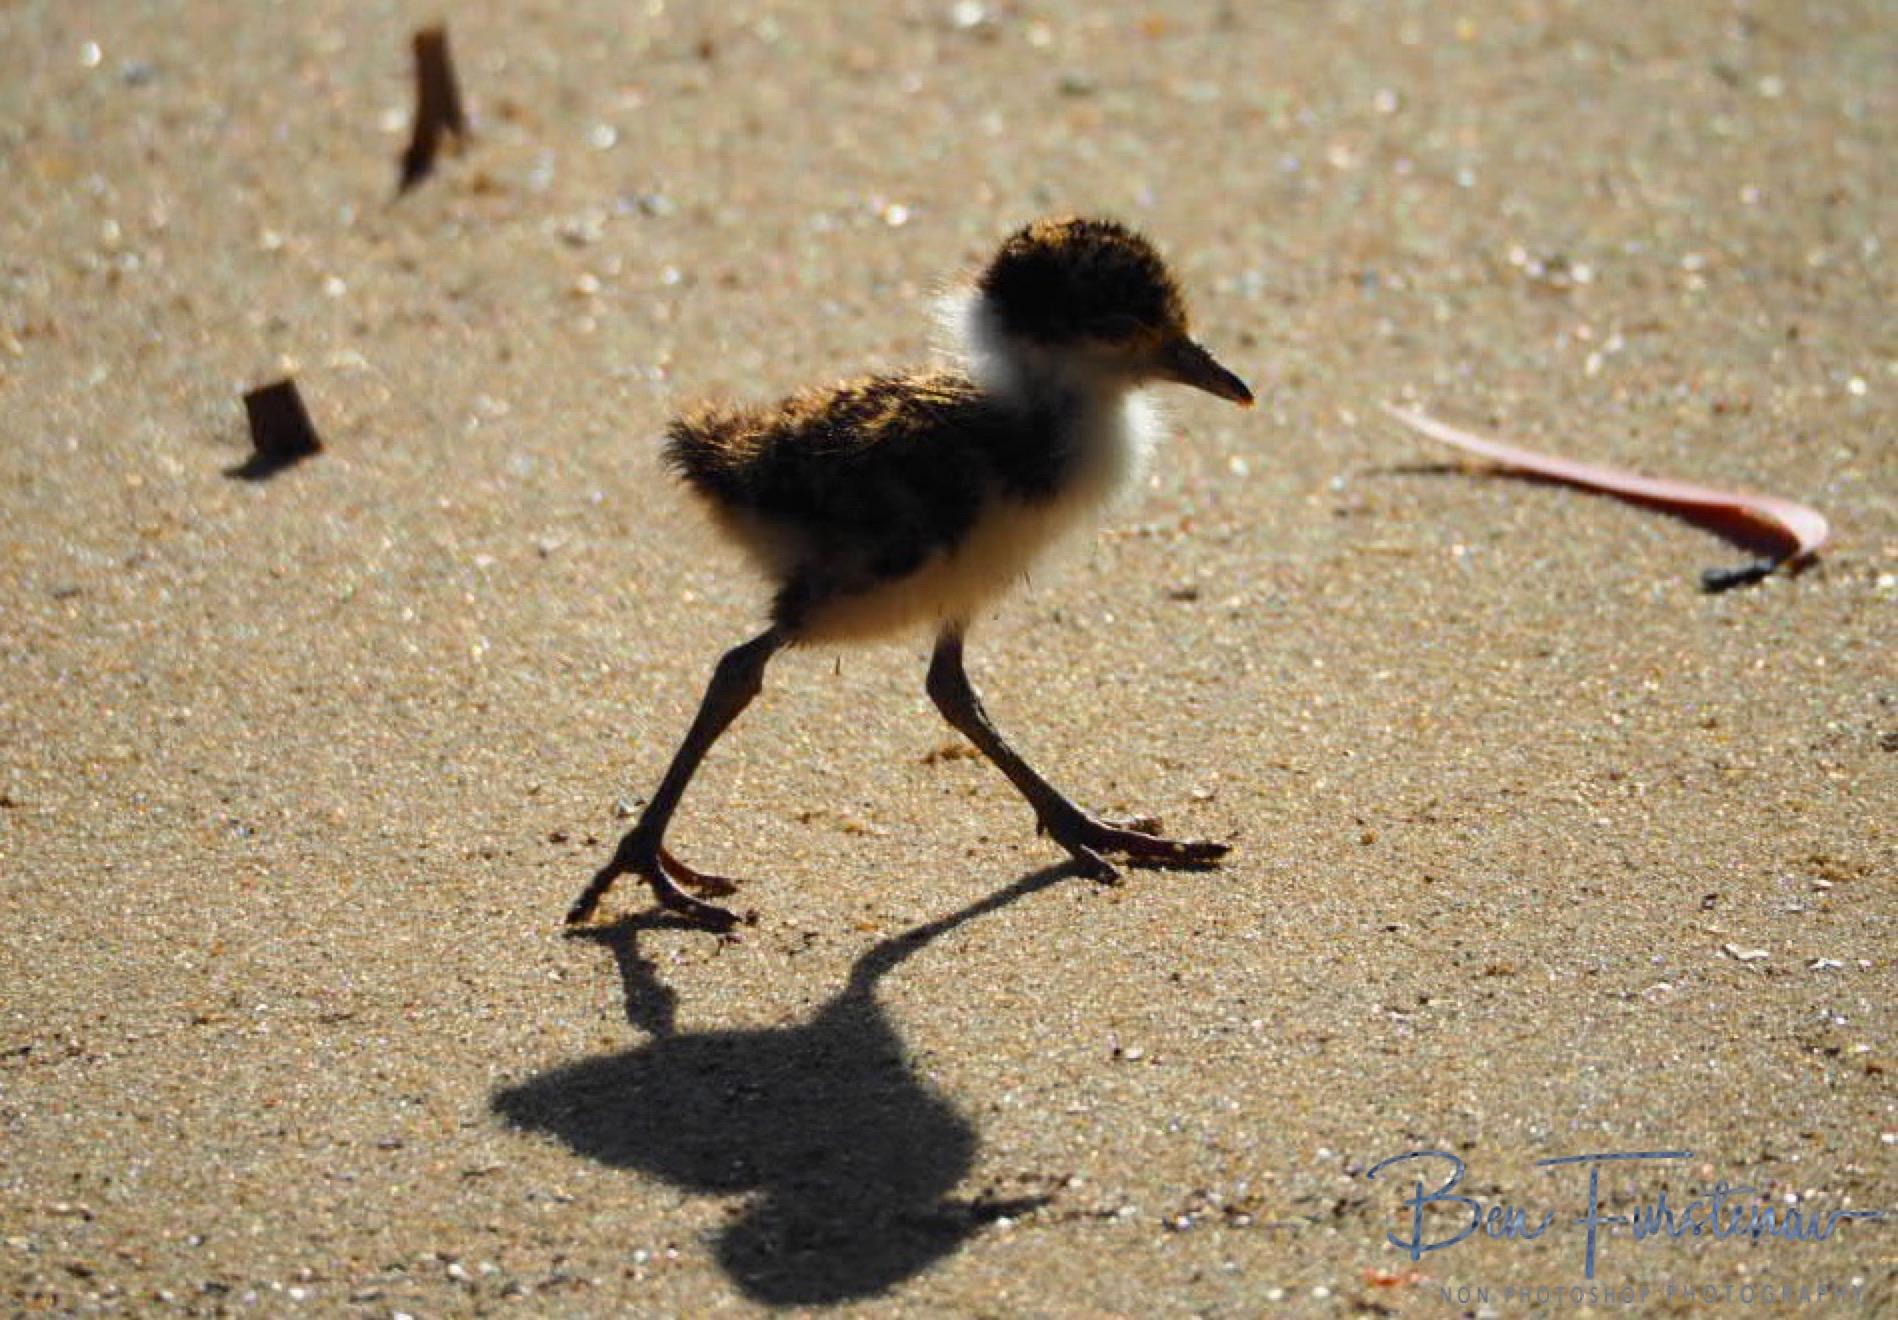 Wandering shadows @ Deception Bay, South-East Queensland, Australia